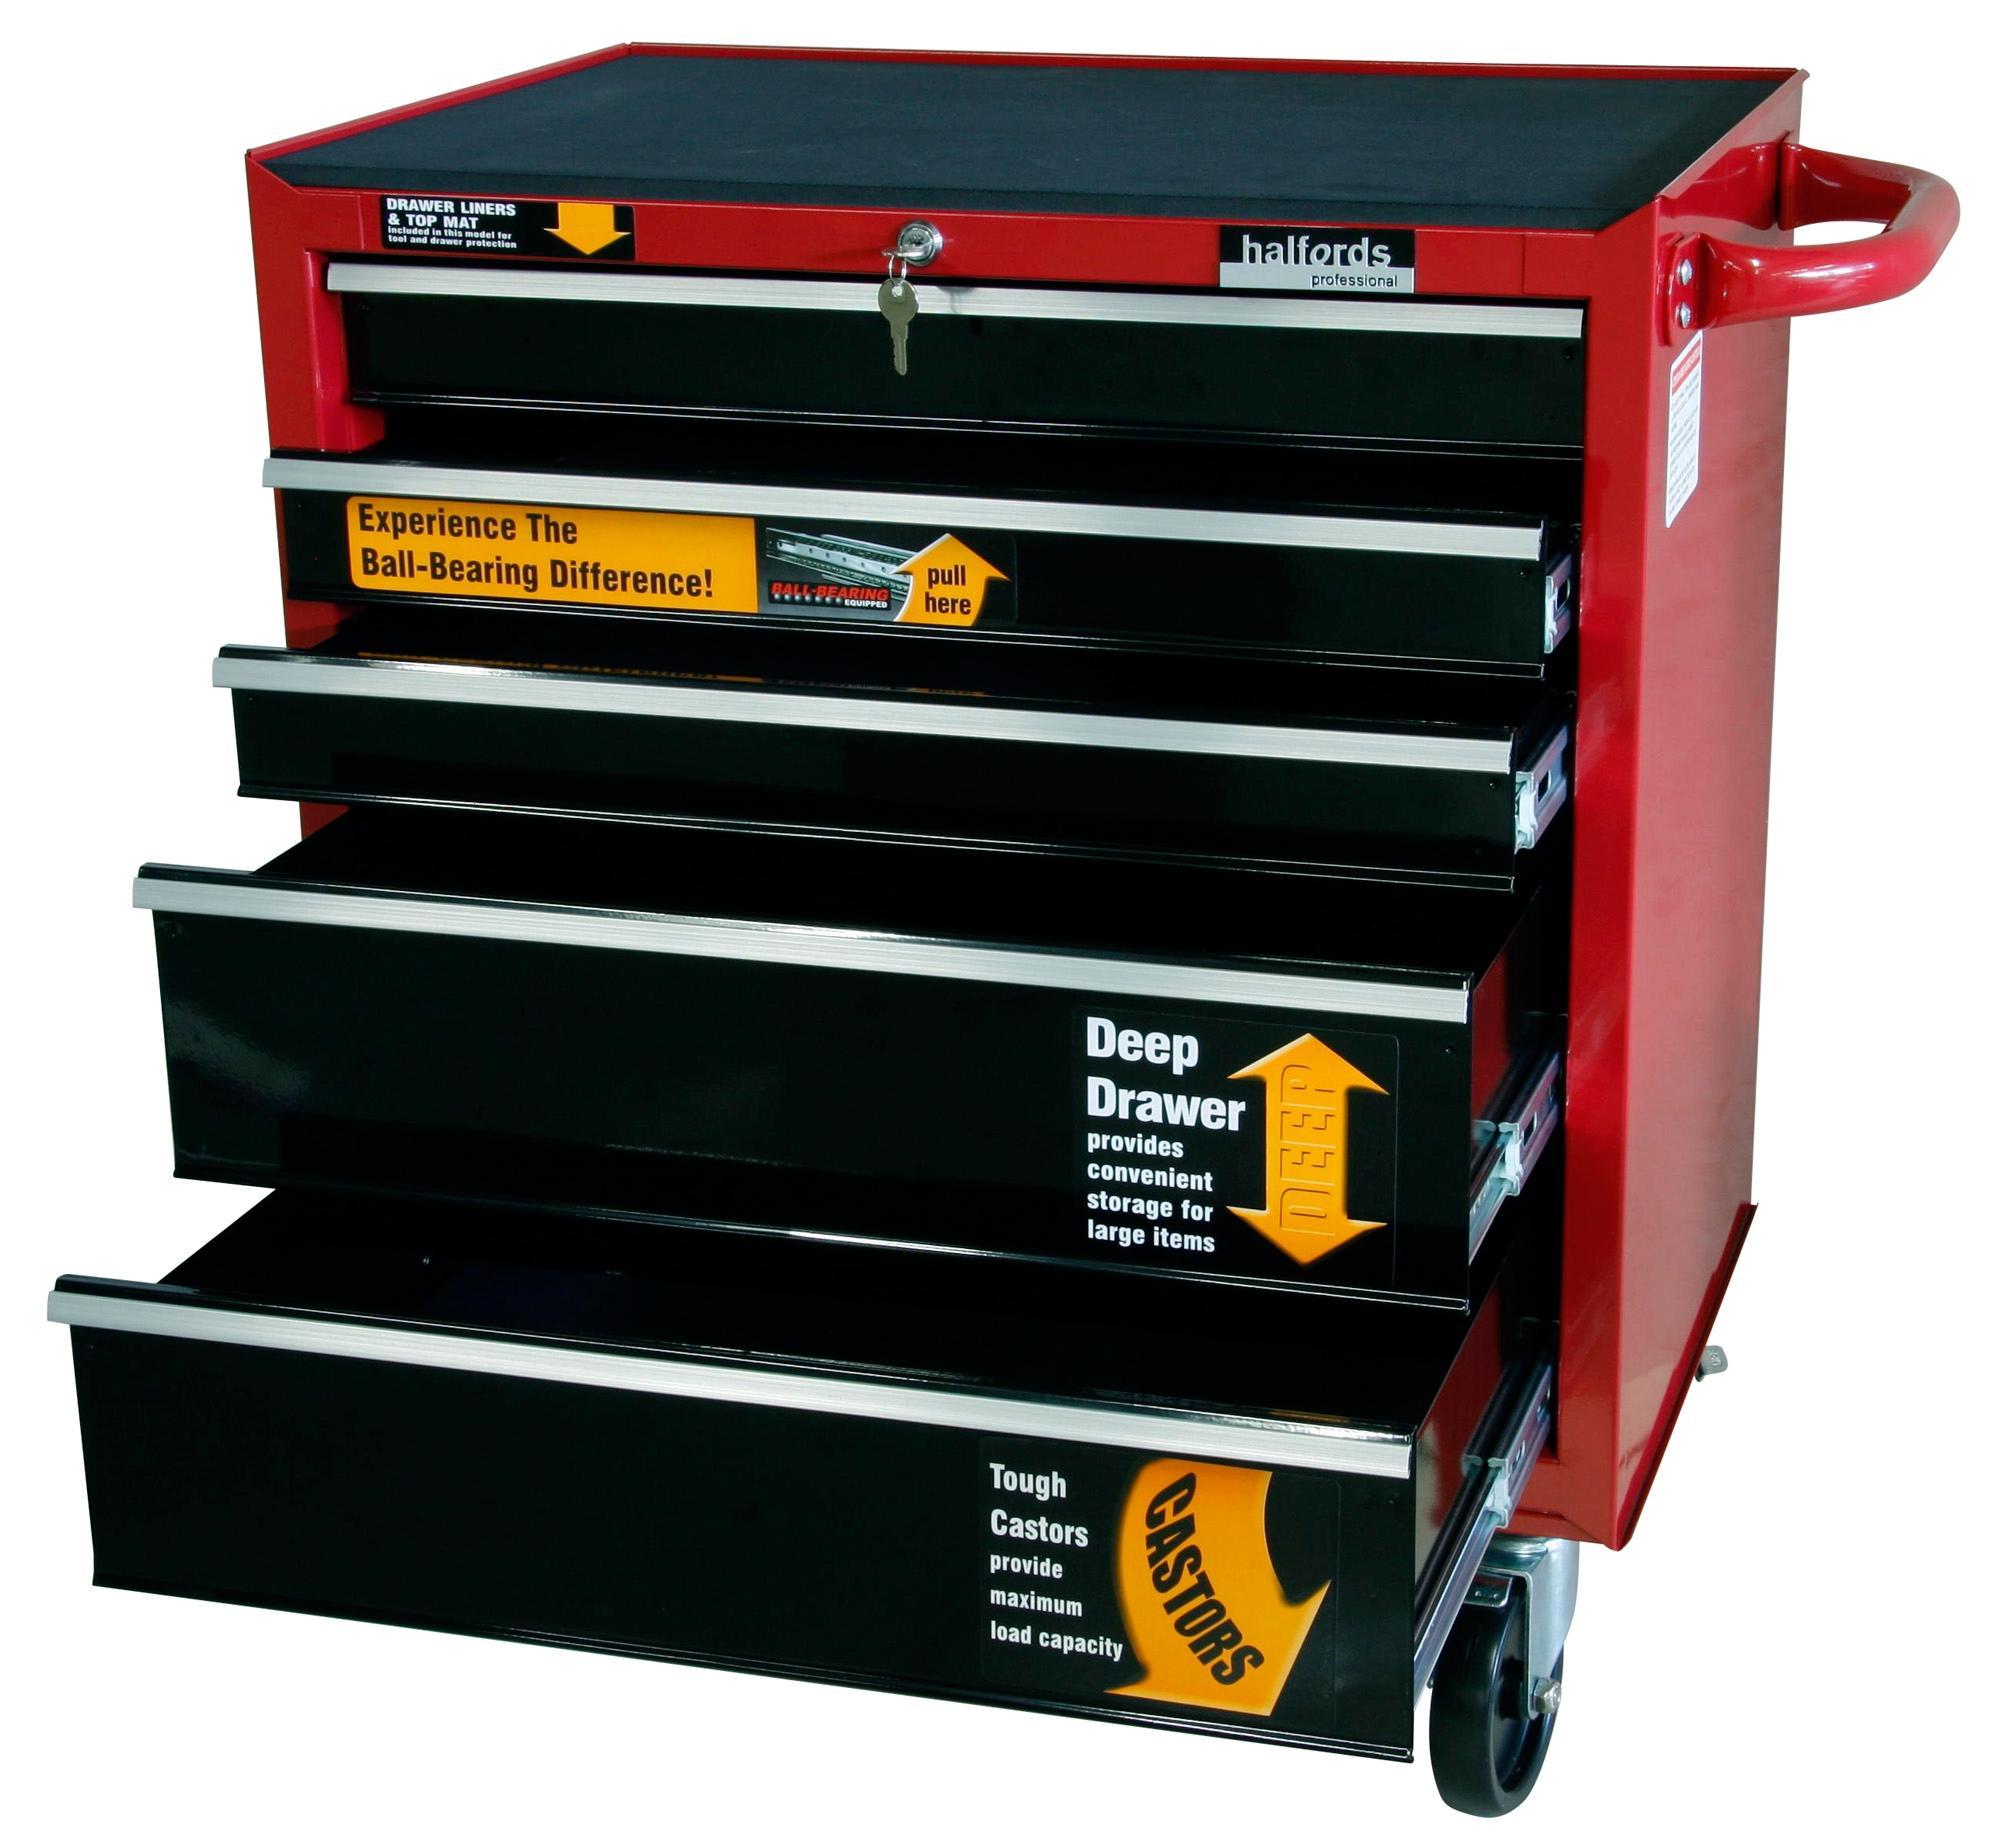 halfords professional 5 drawer ball bearing tool cabinet. Black Bedroom Furniture Sets. Home Design Ideas